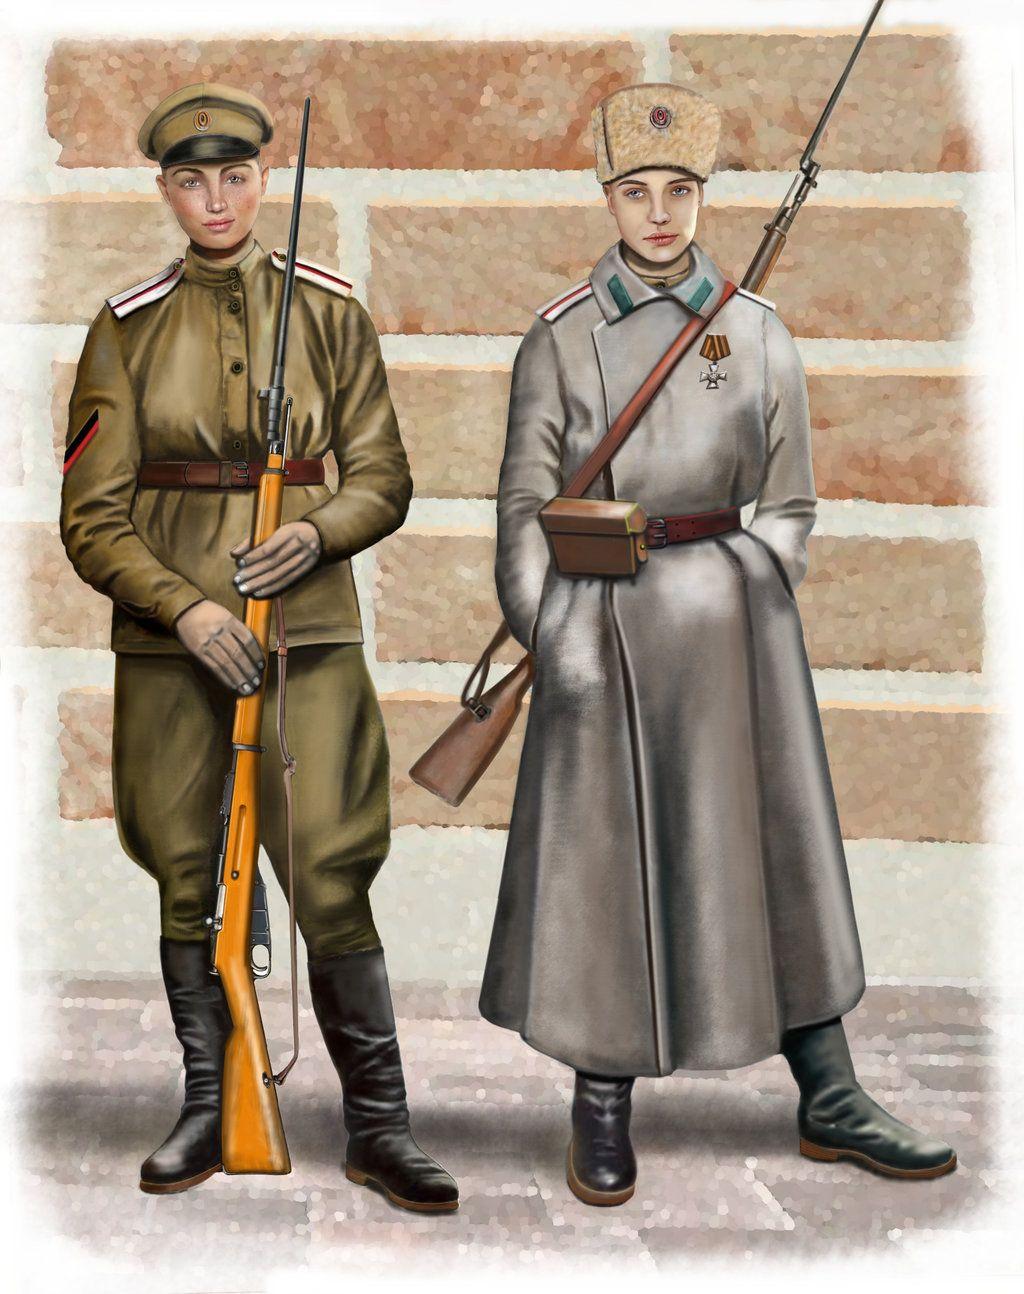 Russia ww1 army uniform   Aesthetic   Army uniform, Military